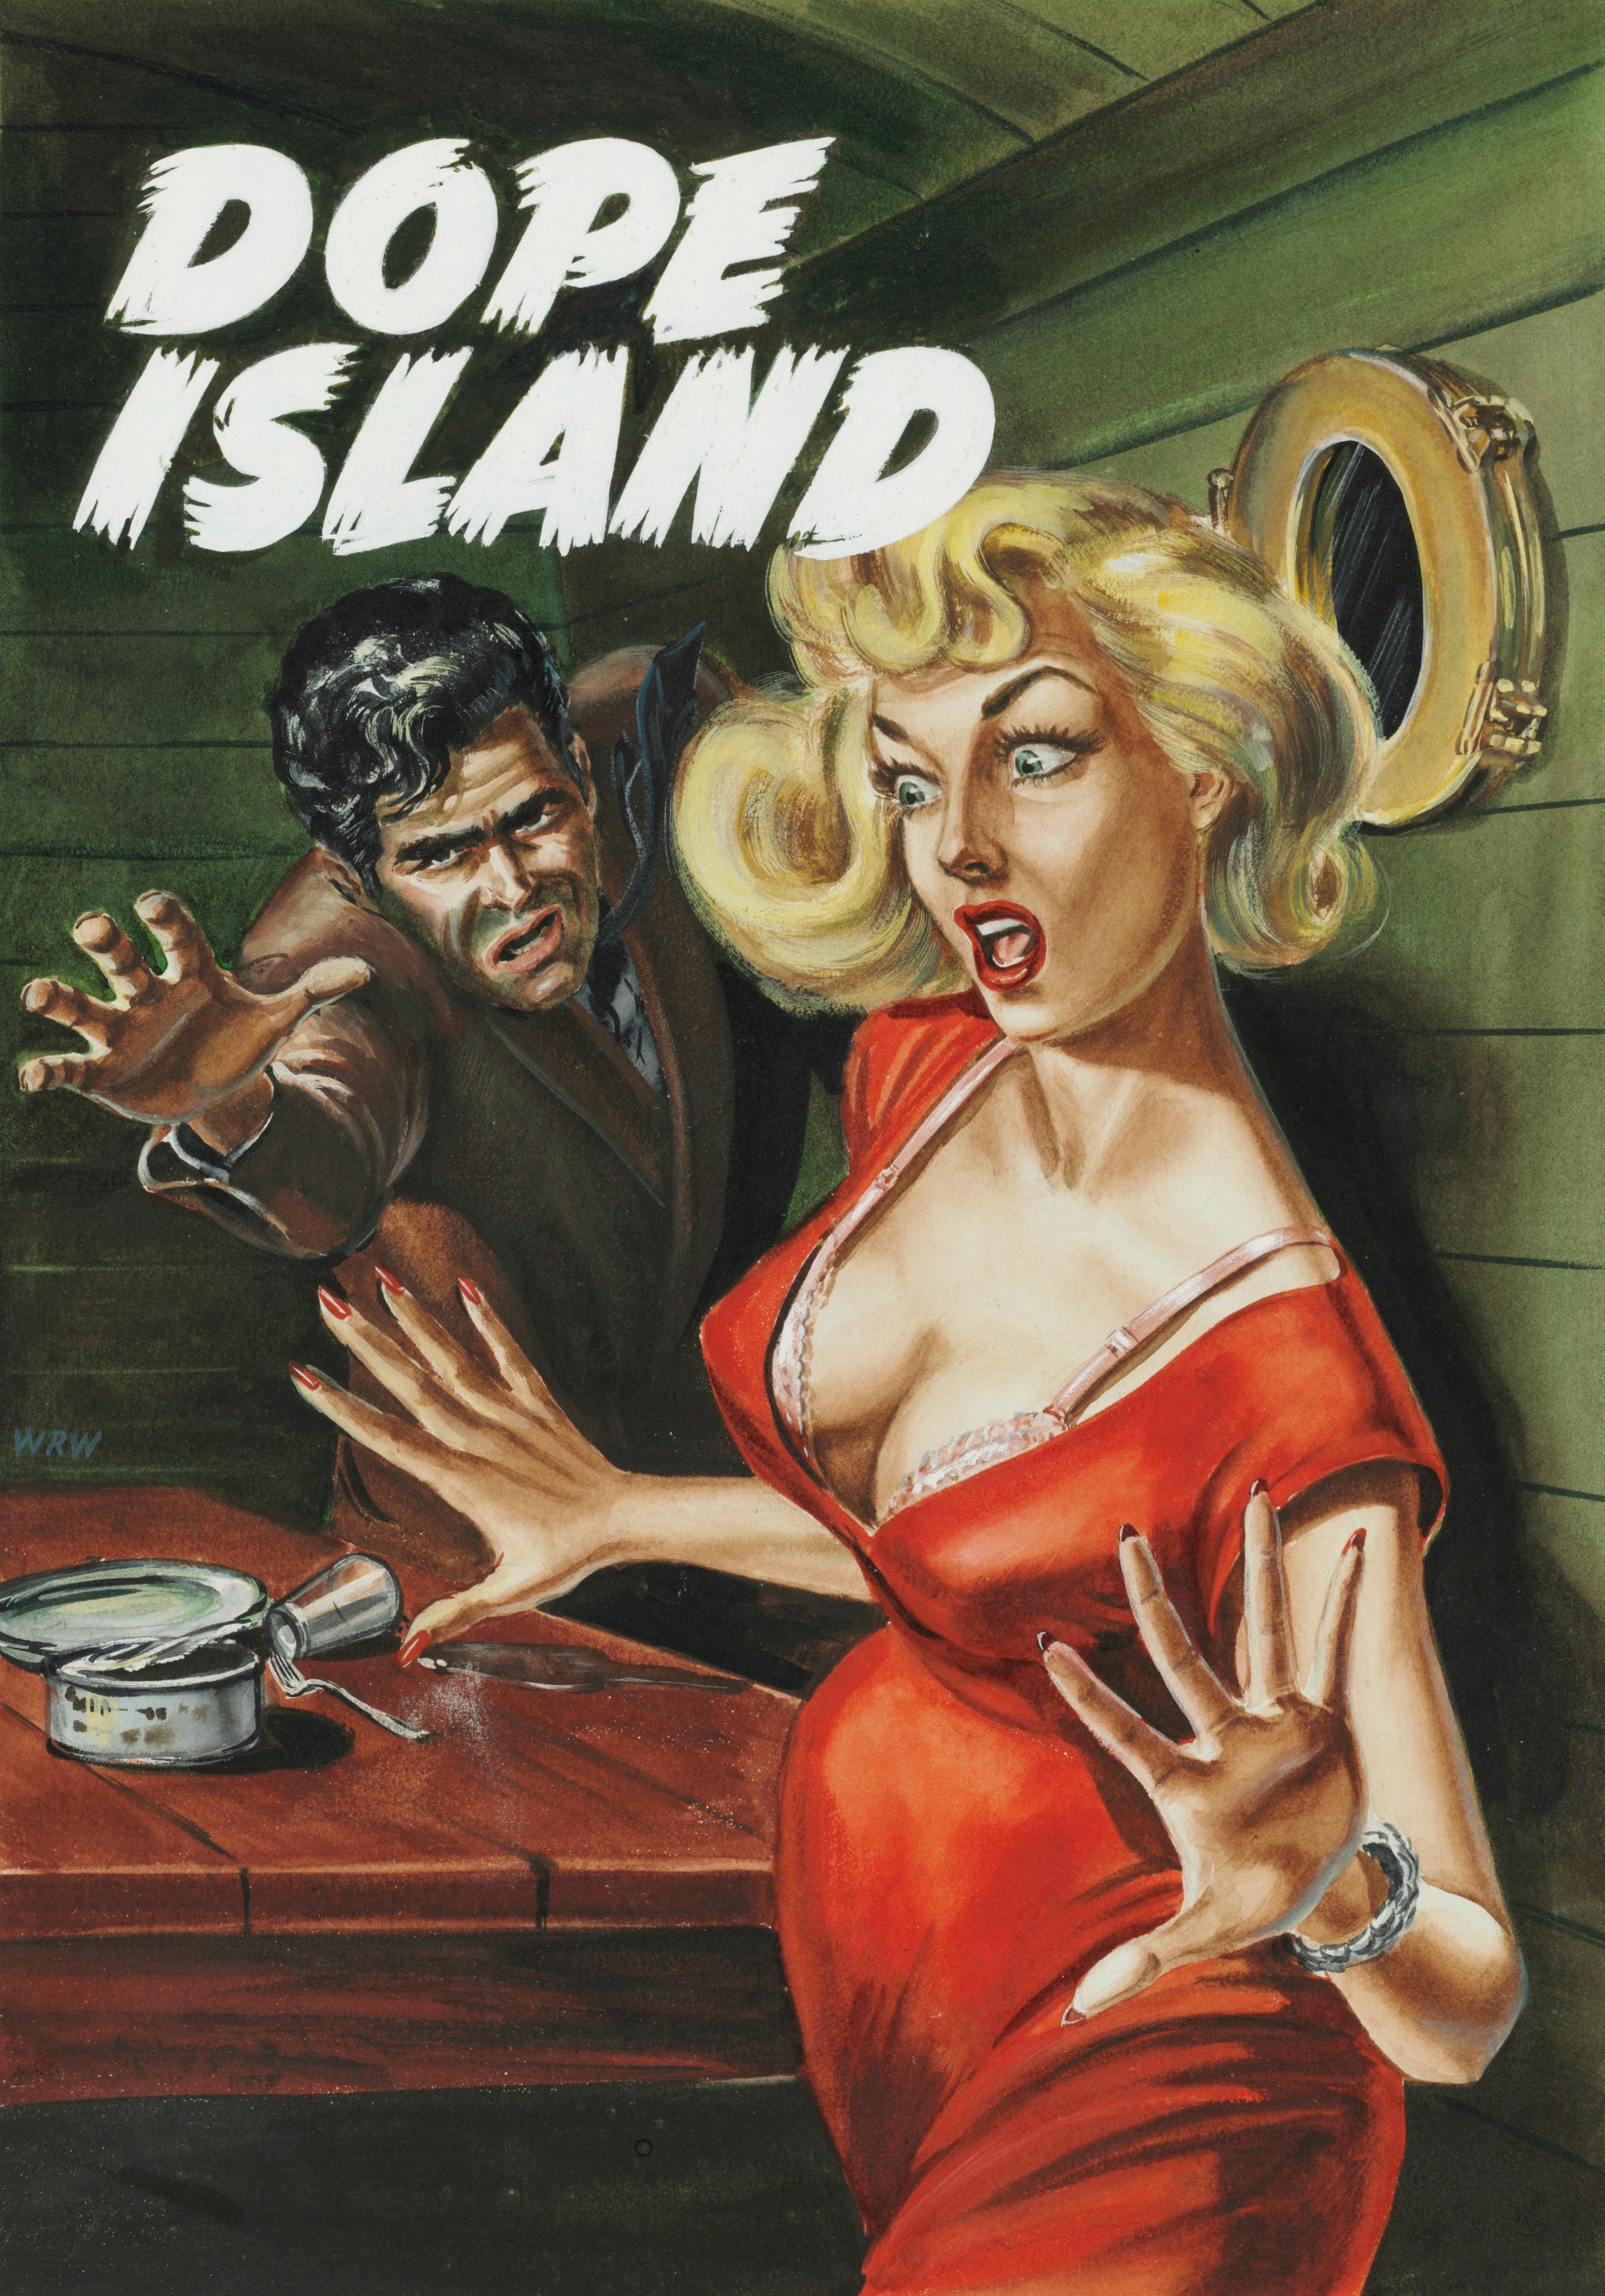 Dope Island